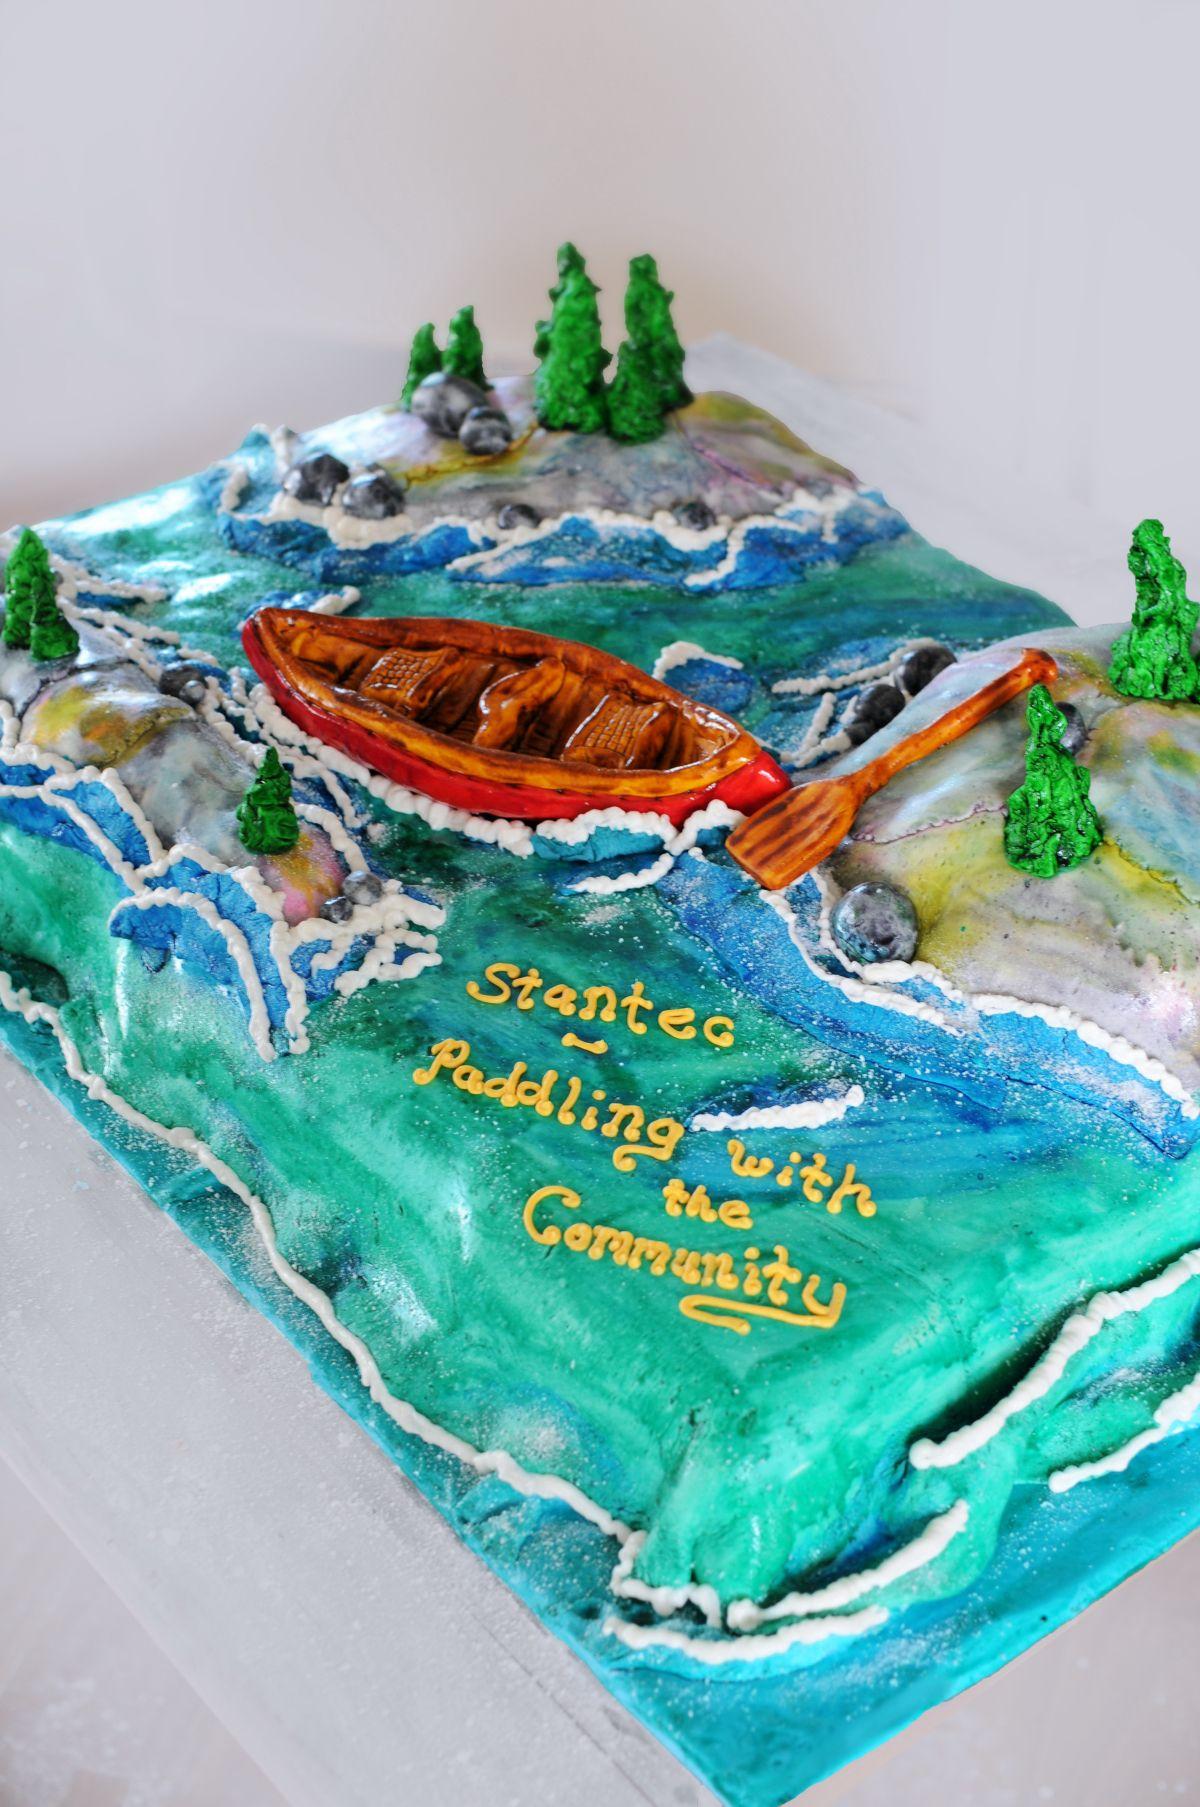 Canoeing Cake Canoe Cake Nature Cake Outdoor Scene Cake